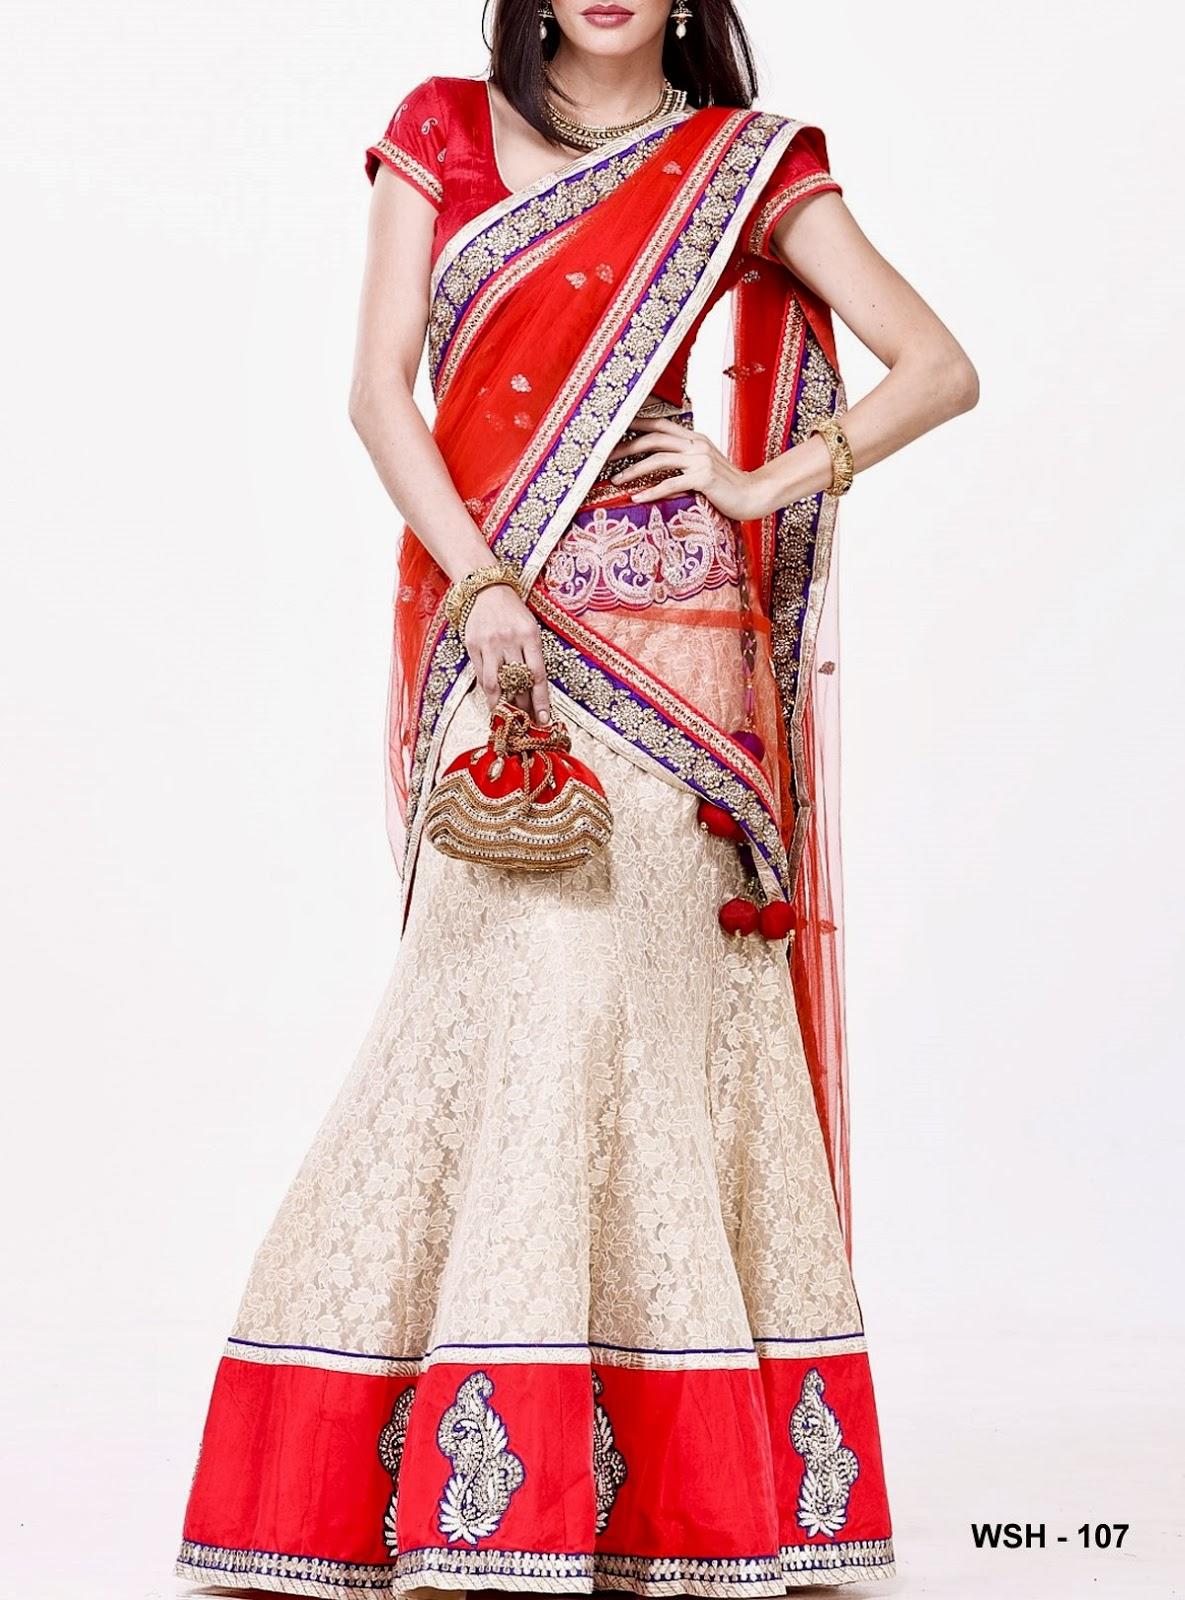 Ravishing Lehenga And Lehenga Saree Collection For Ladies